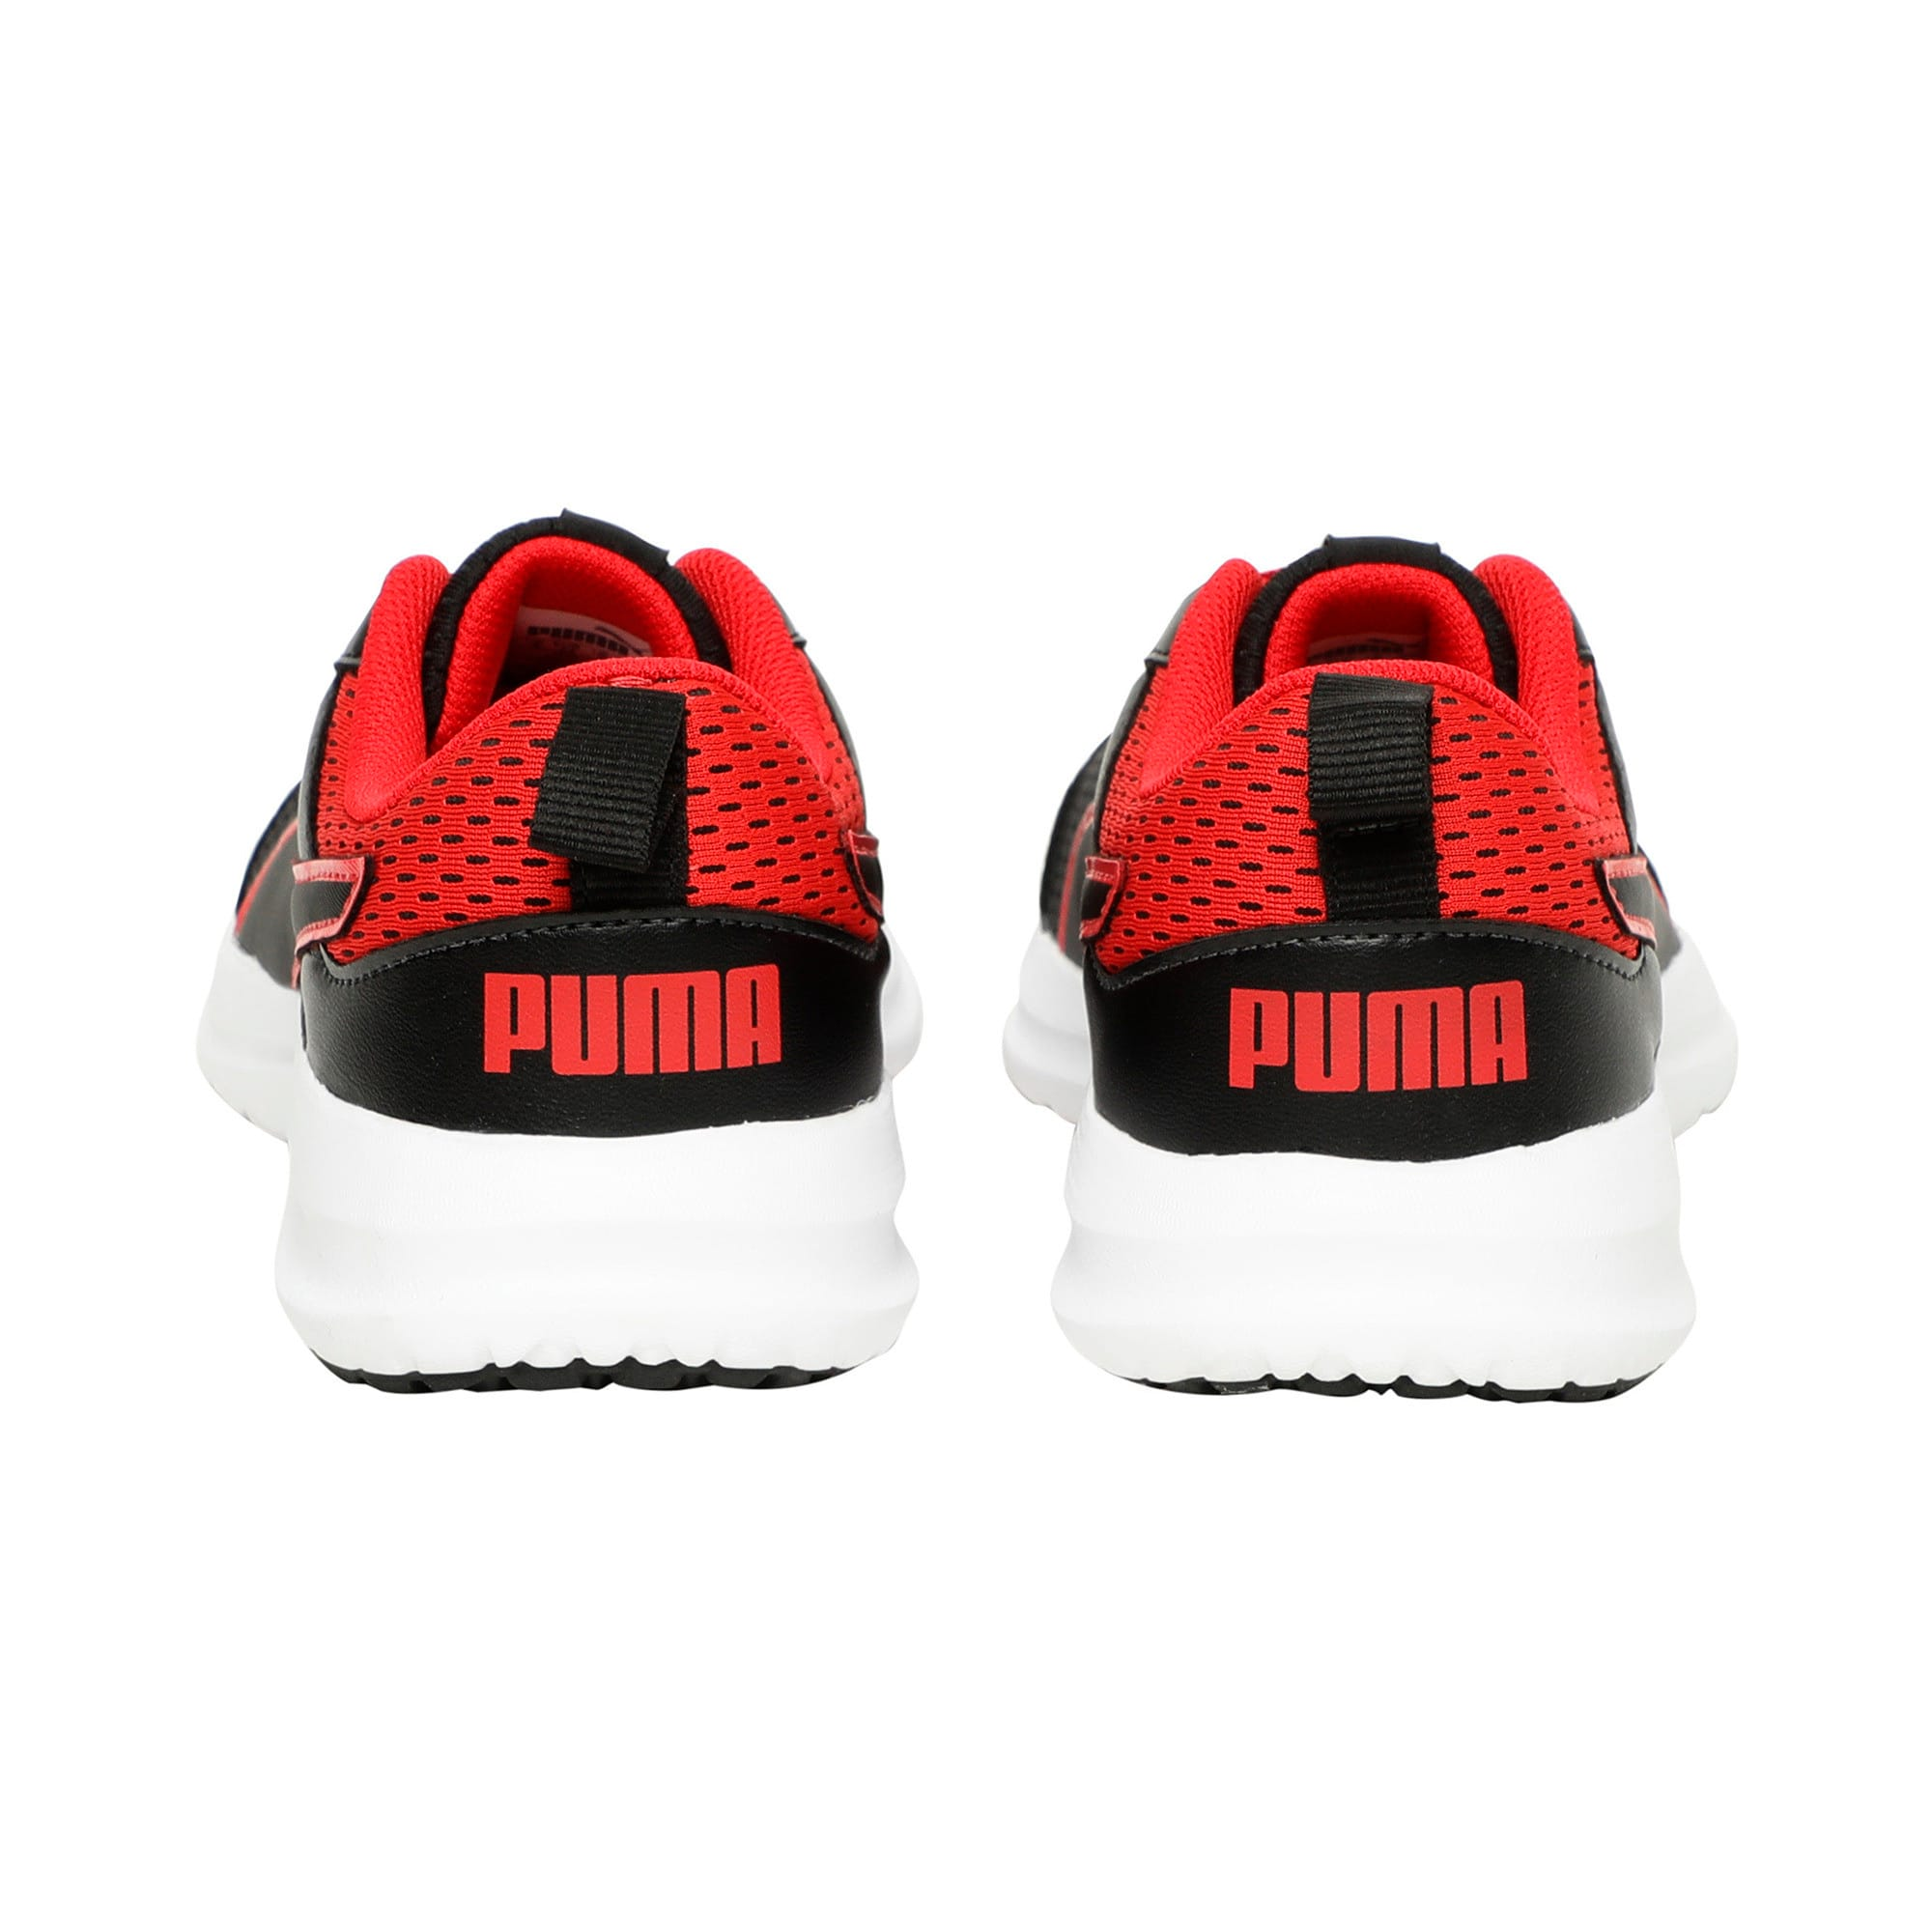 Thumbnail 3 of Dune-dust IDP Puma Black-High Risk Red, Puma Black-High Risk Red, medium-IND